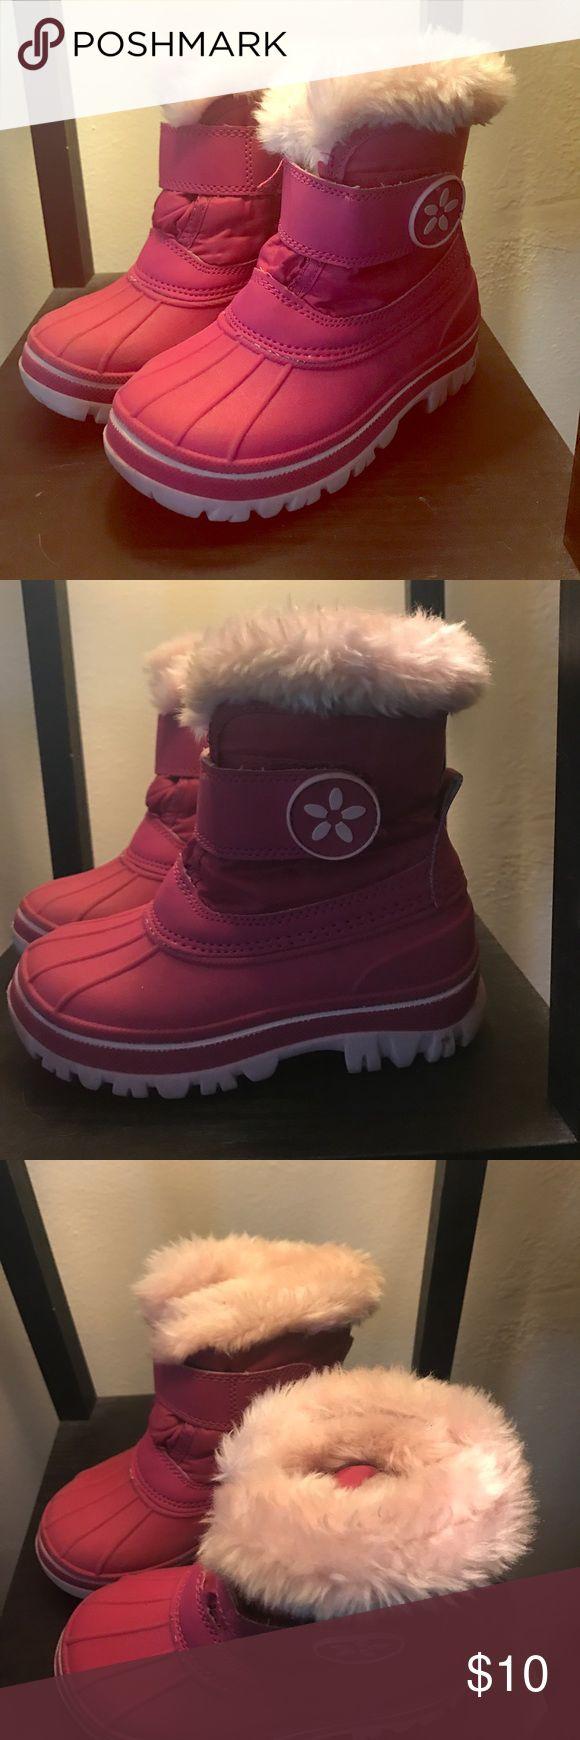 Pink Toddler Snow Boots Pink toddler snow boots with faux fur lining. Velcro closure. Size 7/8. Cat & Jack Shoes Rain & Snow Boots